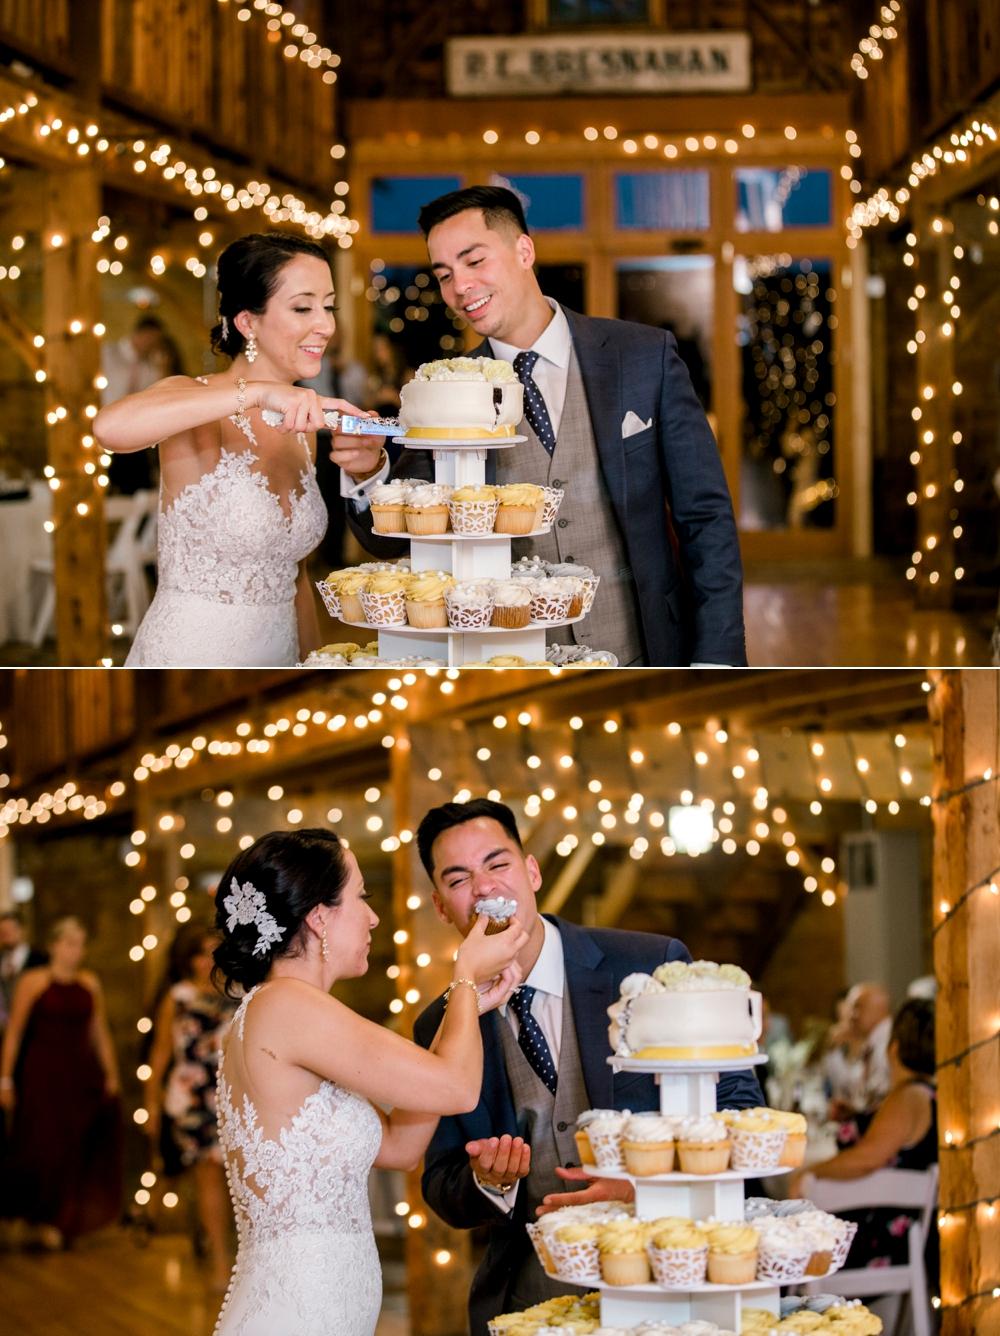 SomerbyJonesPhotography__SmithBarnWedding_SmithBarn_WeddingatSmithBarn_0053.jpg